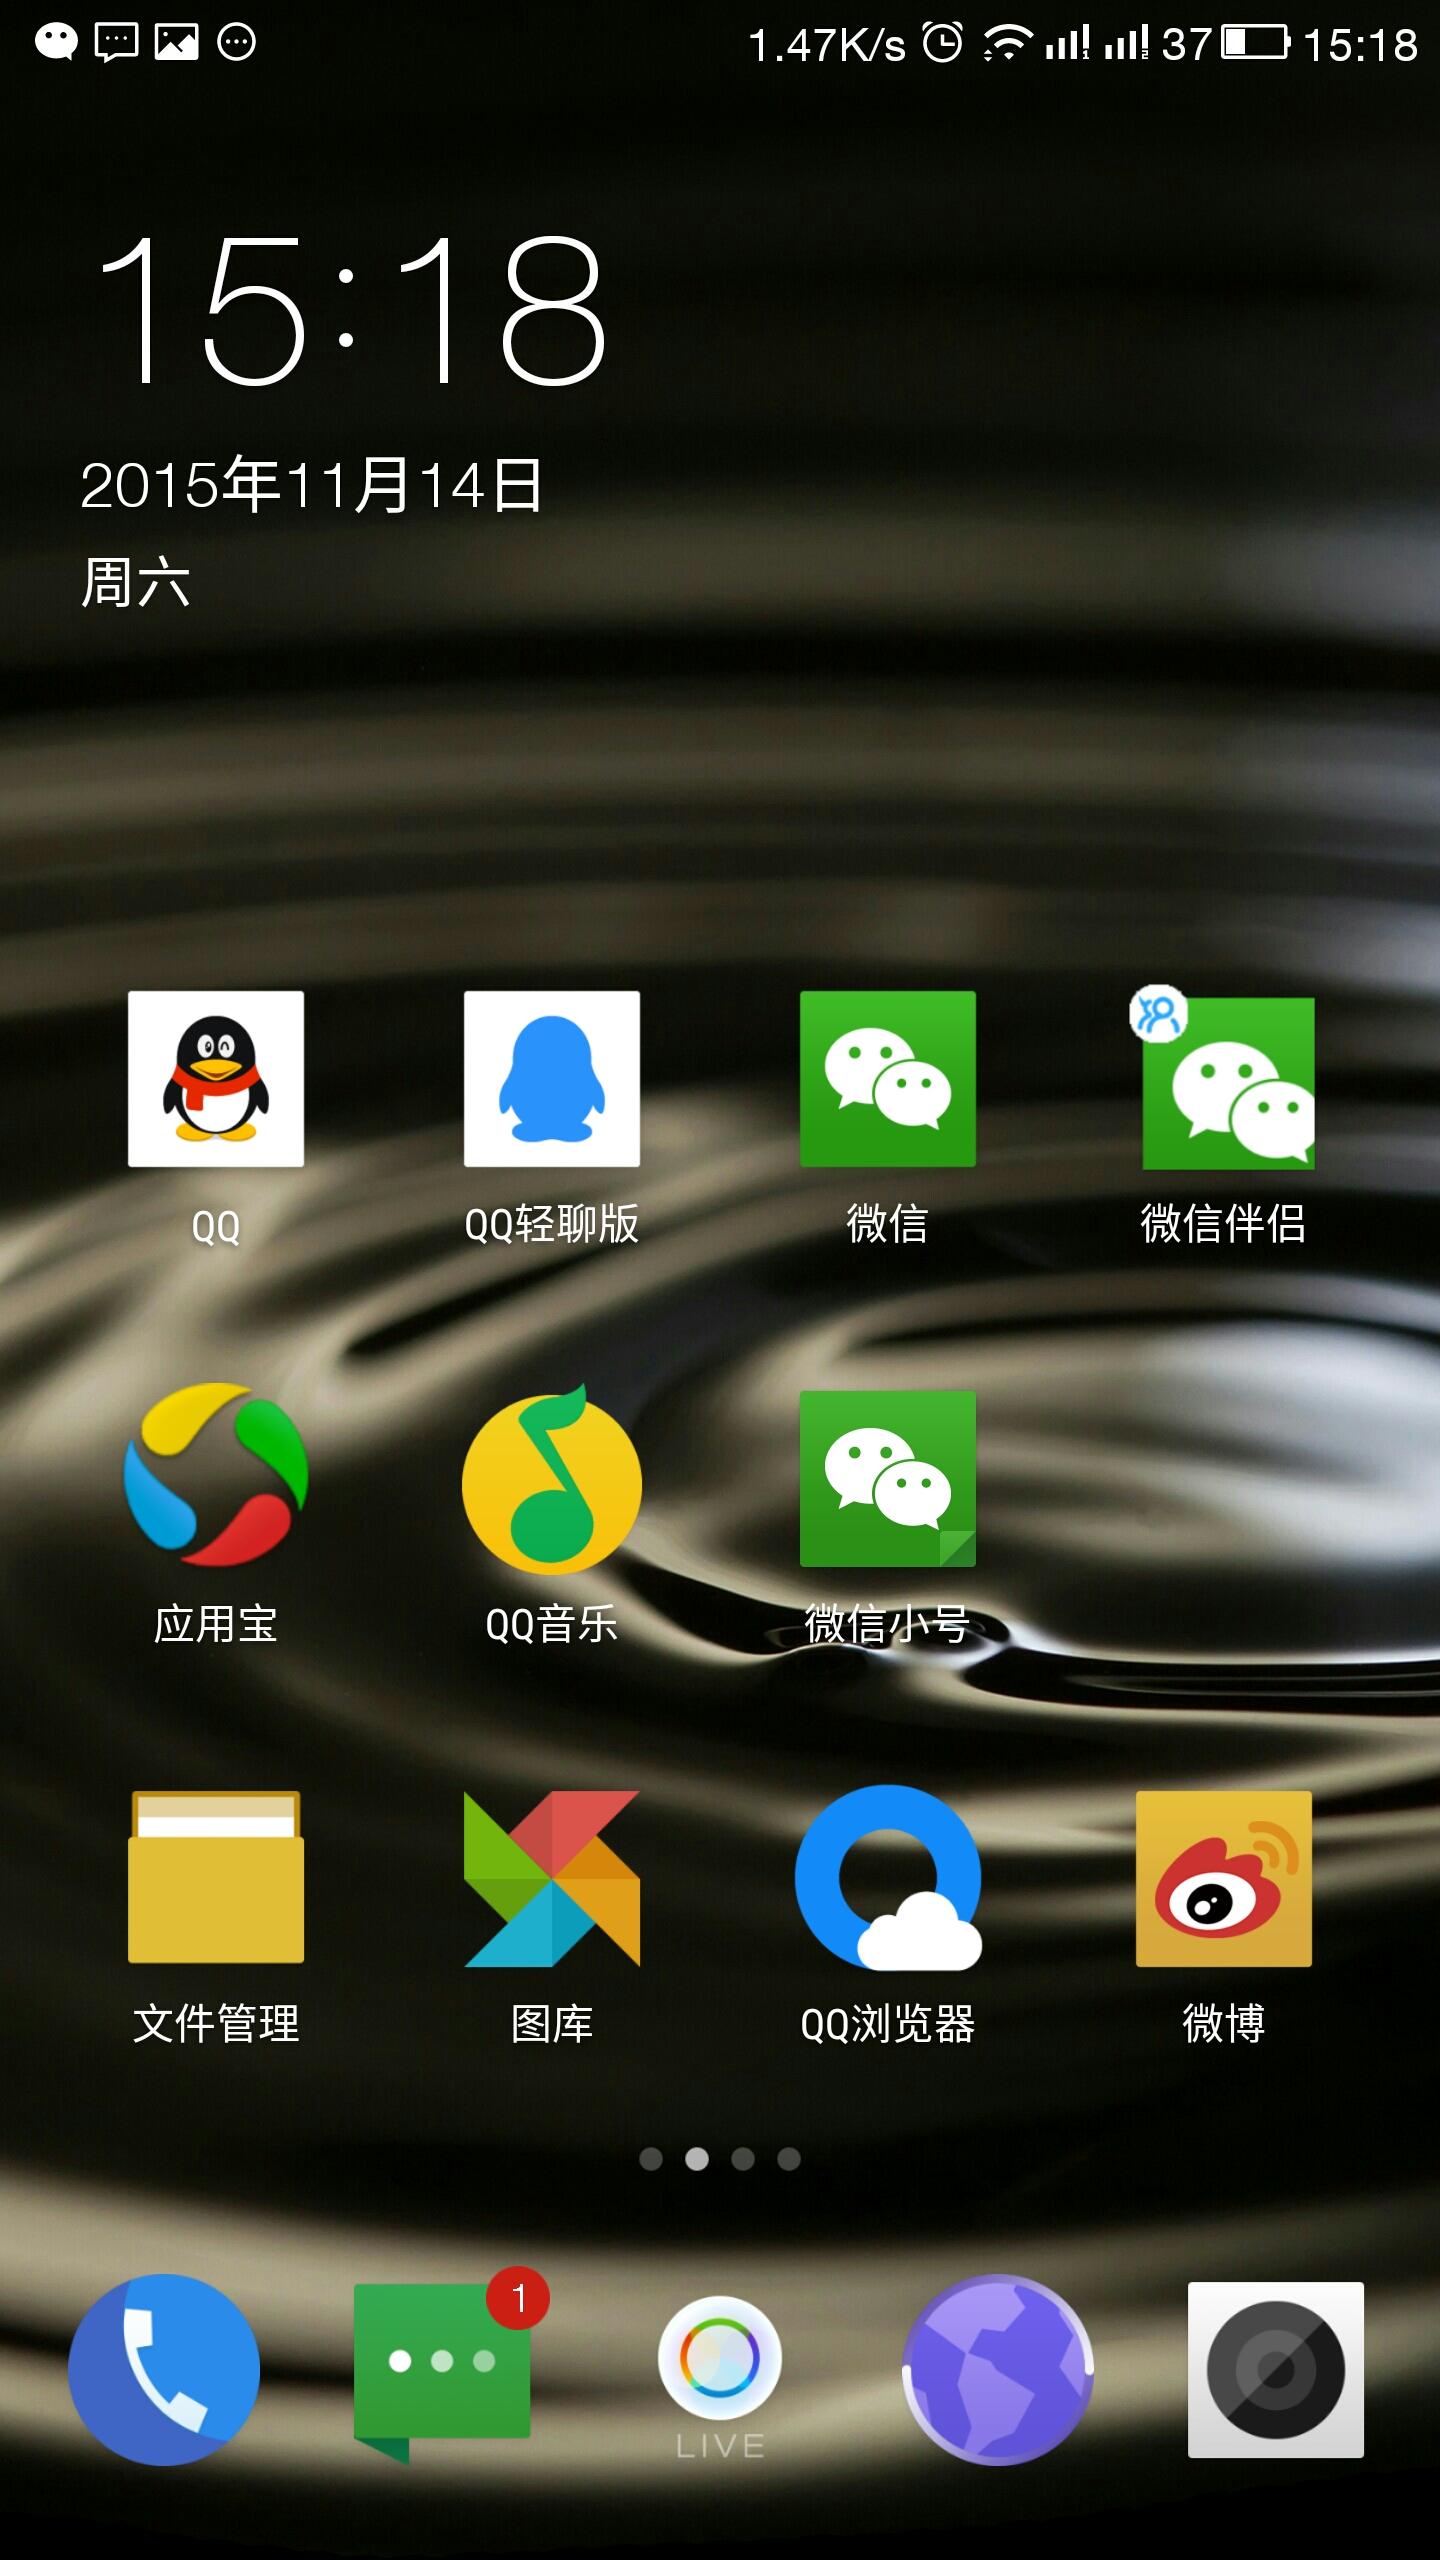 Screenshot_2015-11-14-15-18-17.png